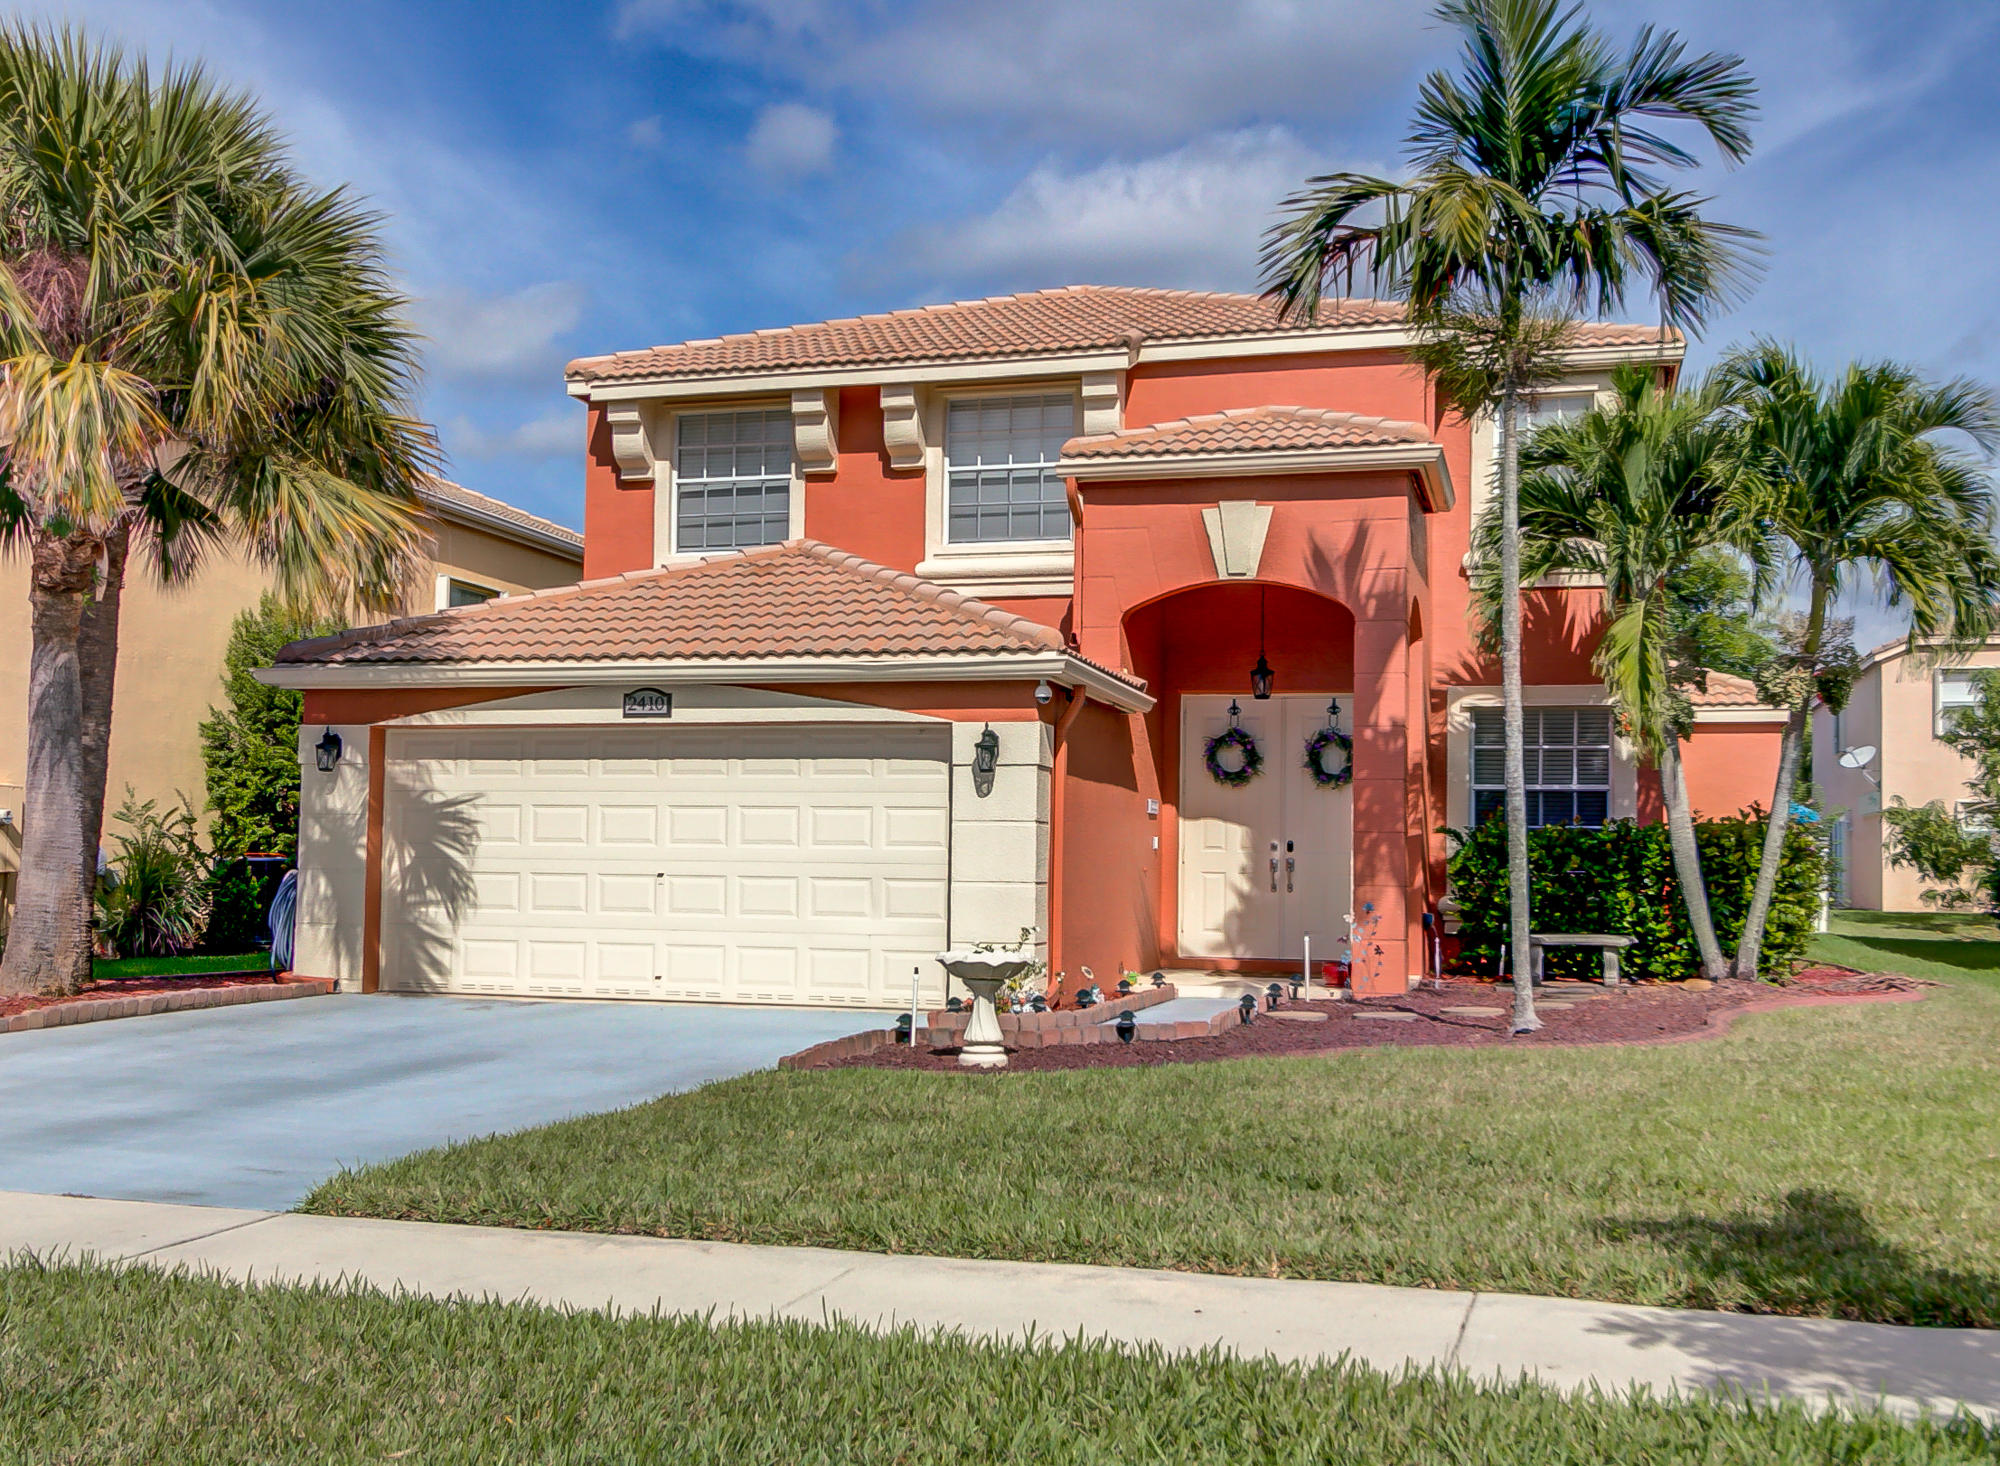 Photo of 2410 Westmont Drive, Royal Palm Beach, FL 33411